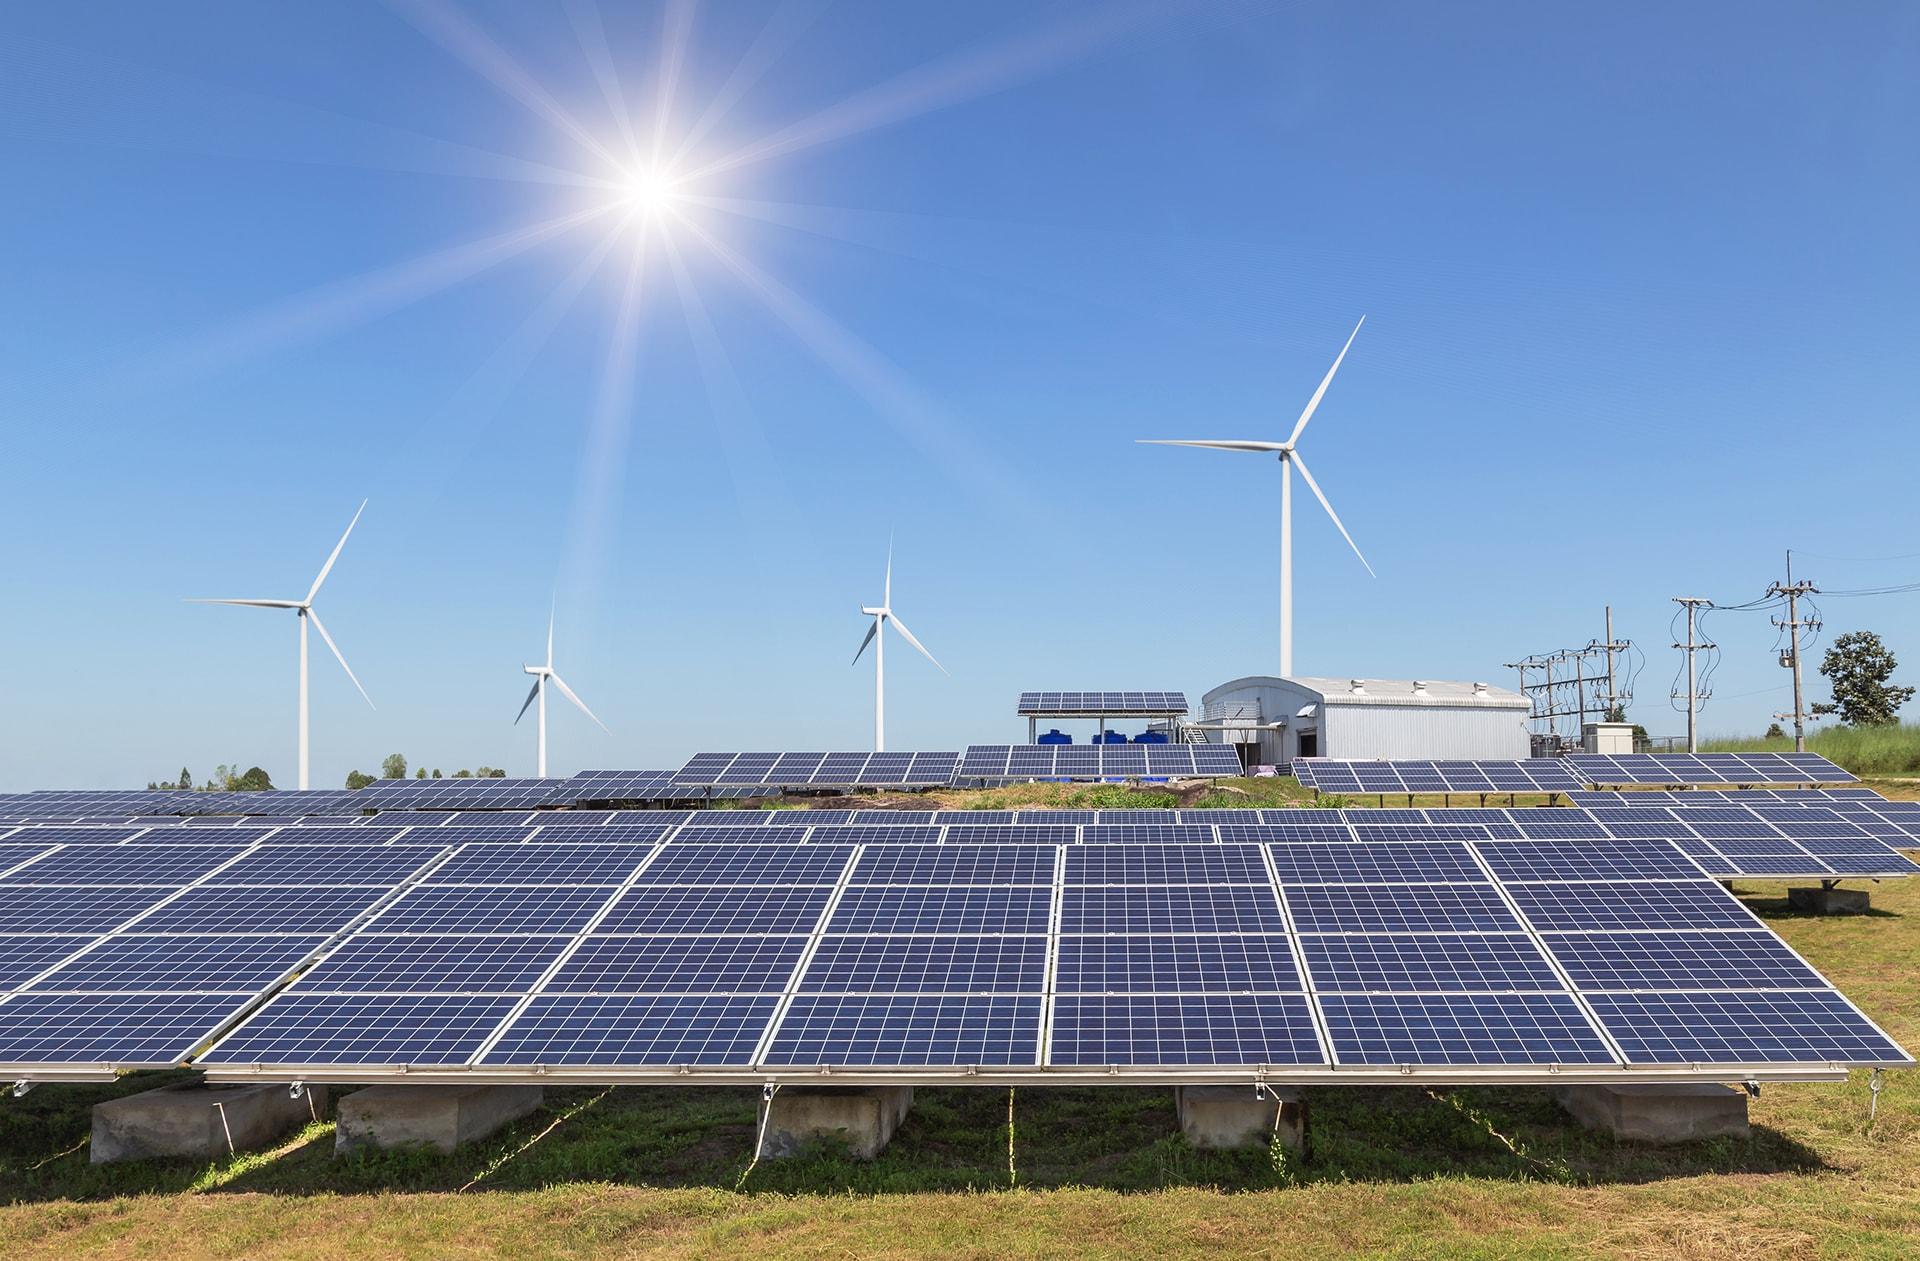 solar solution sunsights